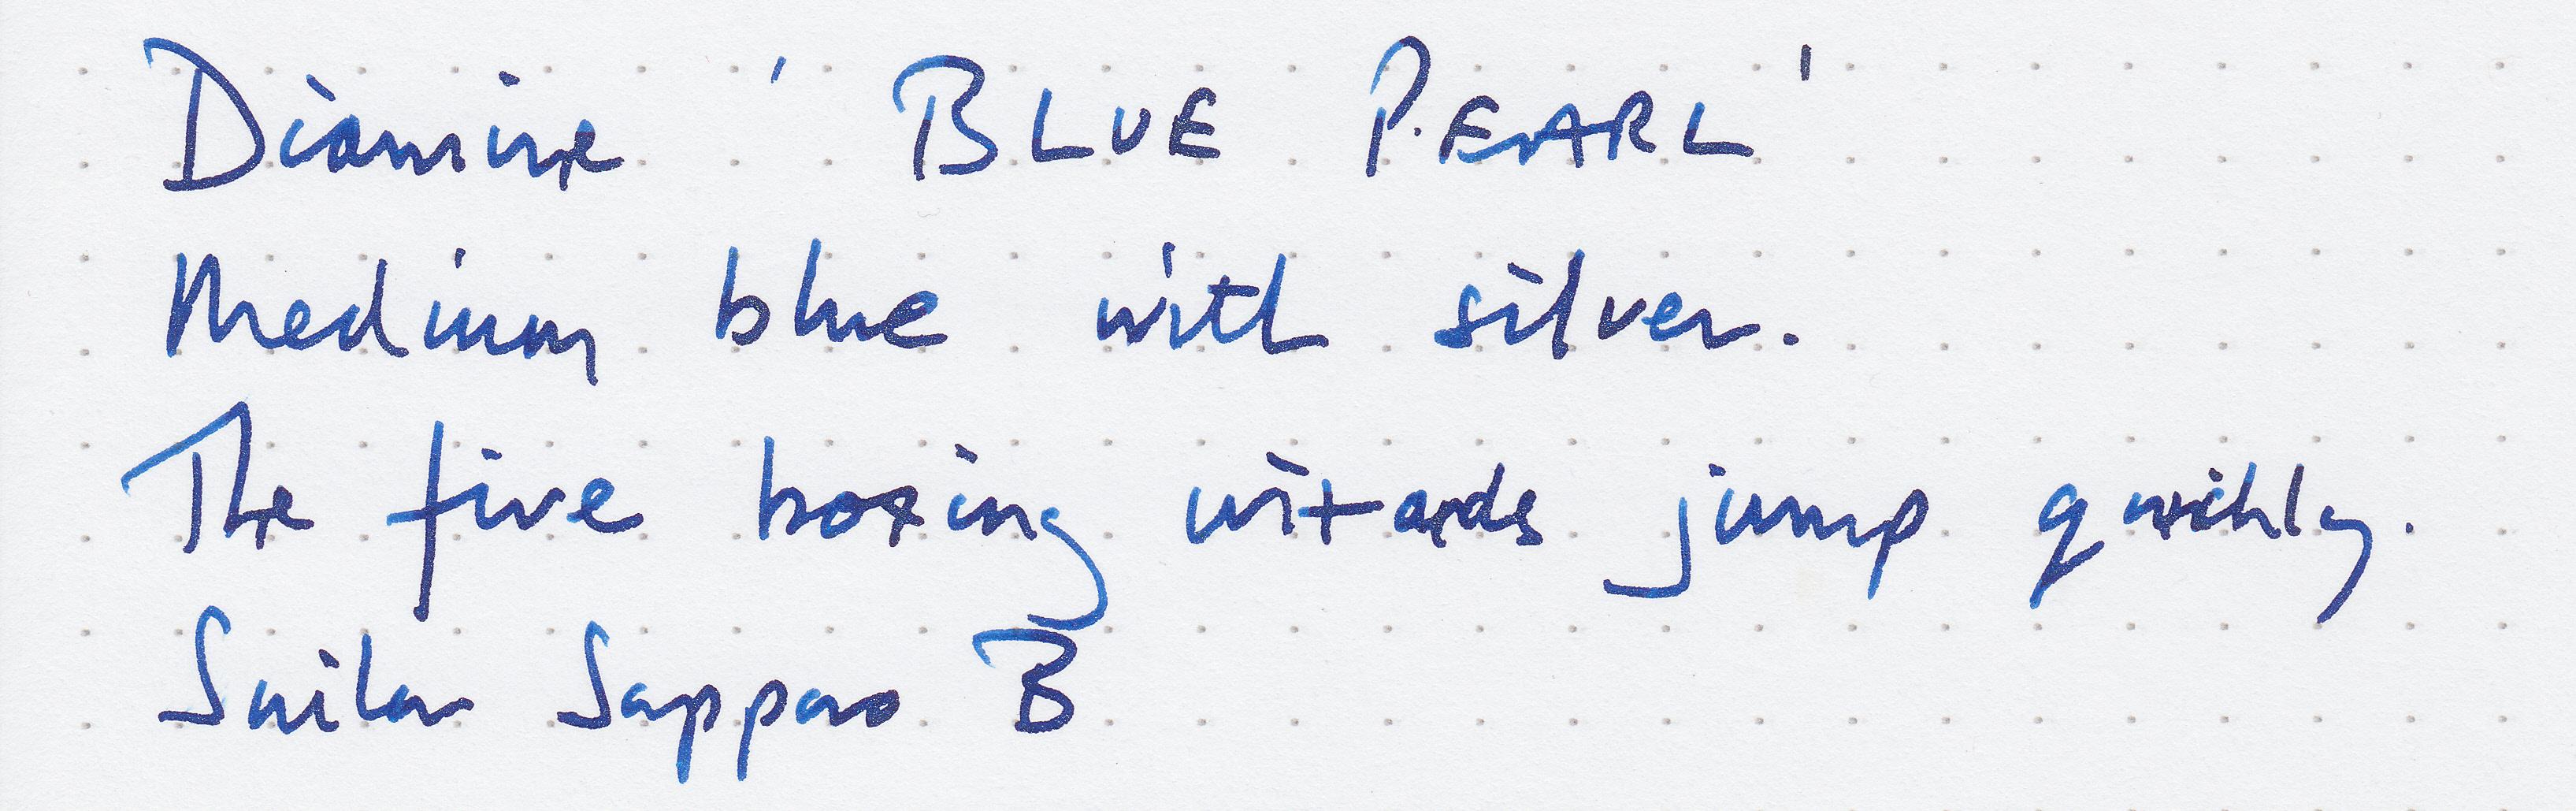 fpn_1440692383__diamine_blue_pearl.jpg